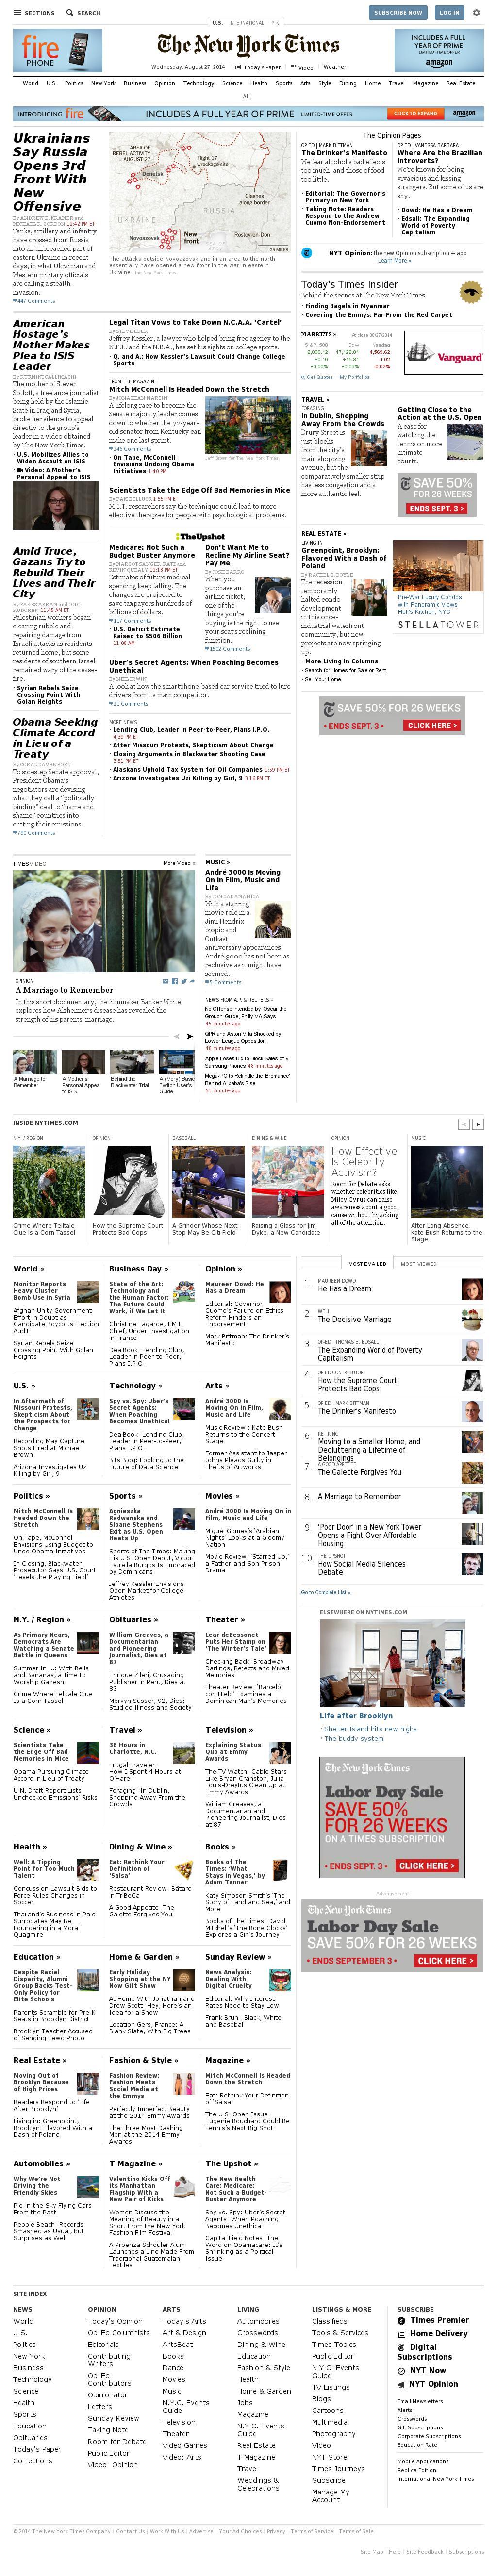 The New York Times at Wednesday Aug. 27, 2014, 10:12 p.m. UTC